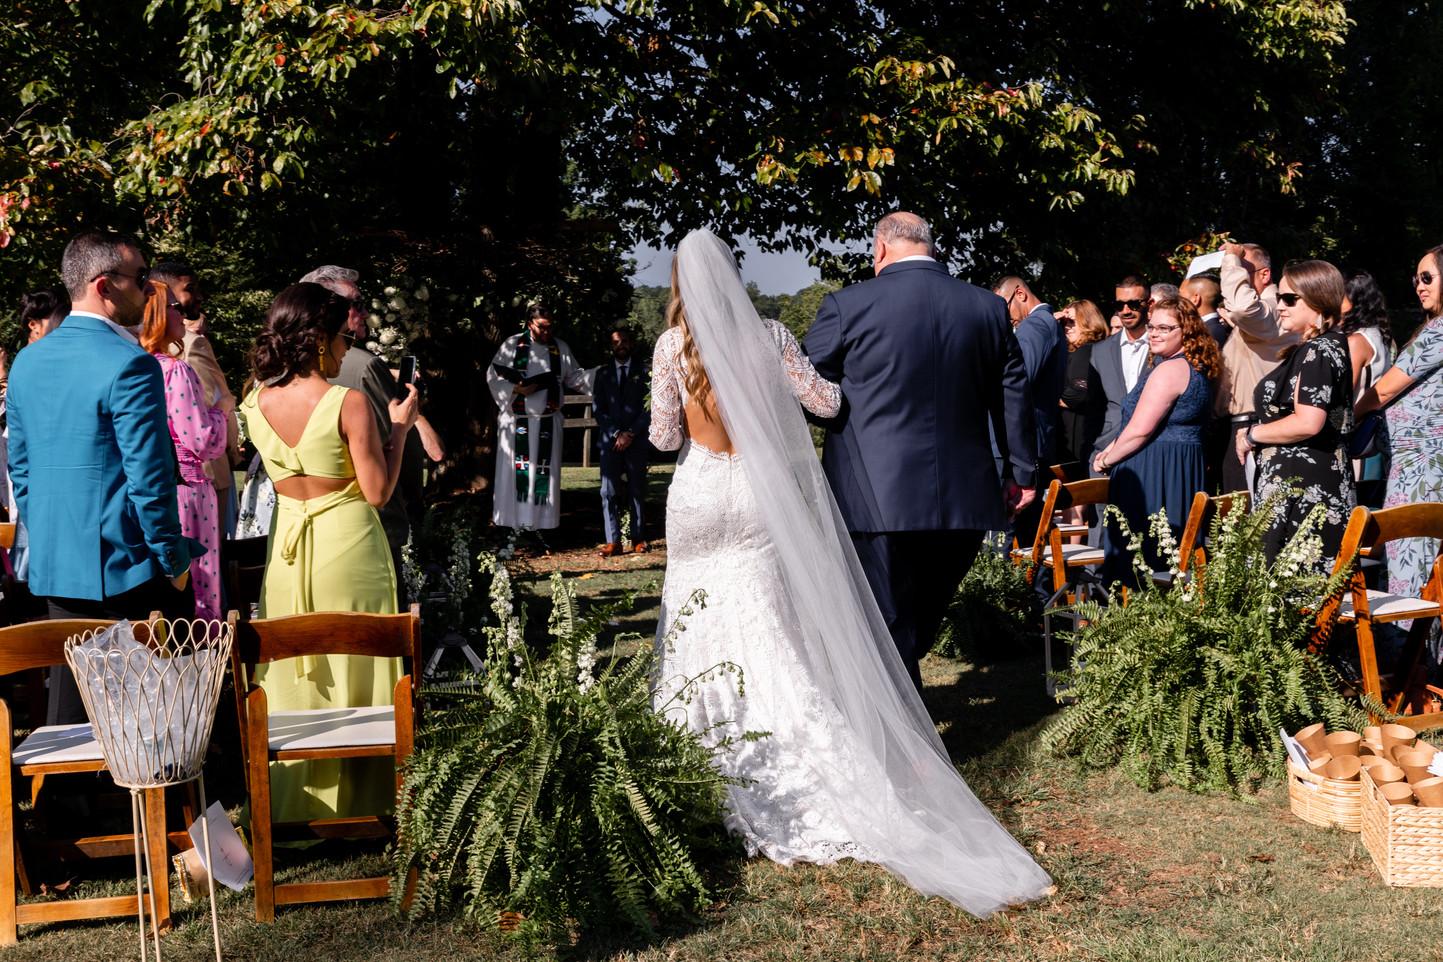 Arlen-Katelyn-Wedding-564.jpg